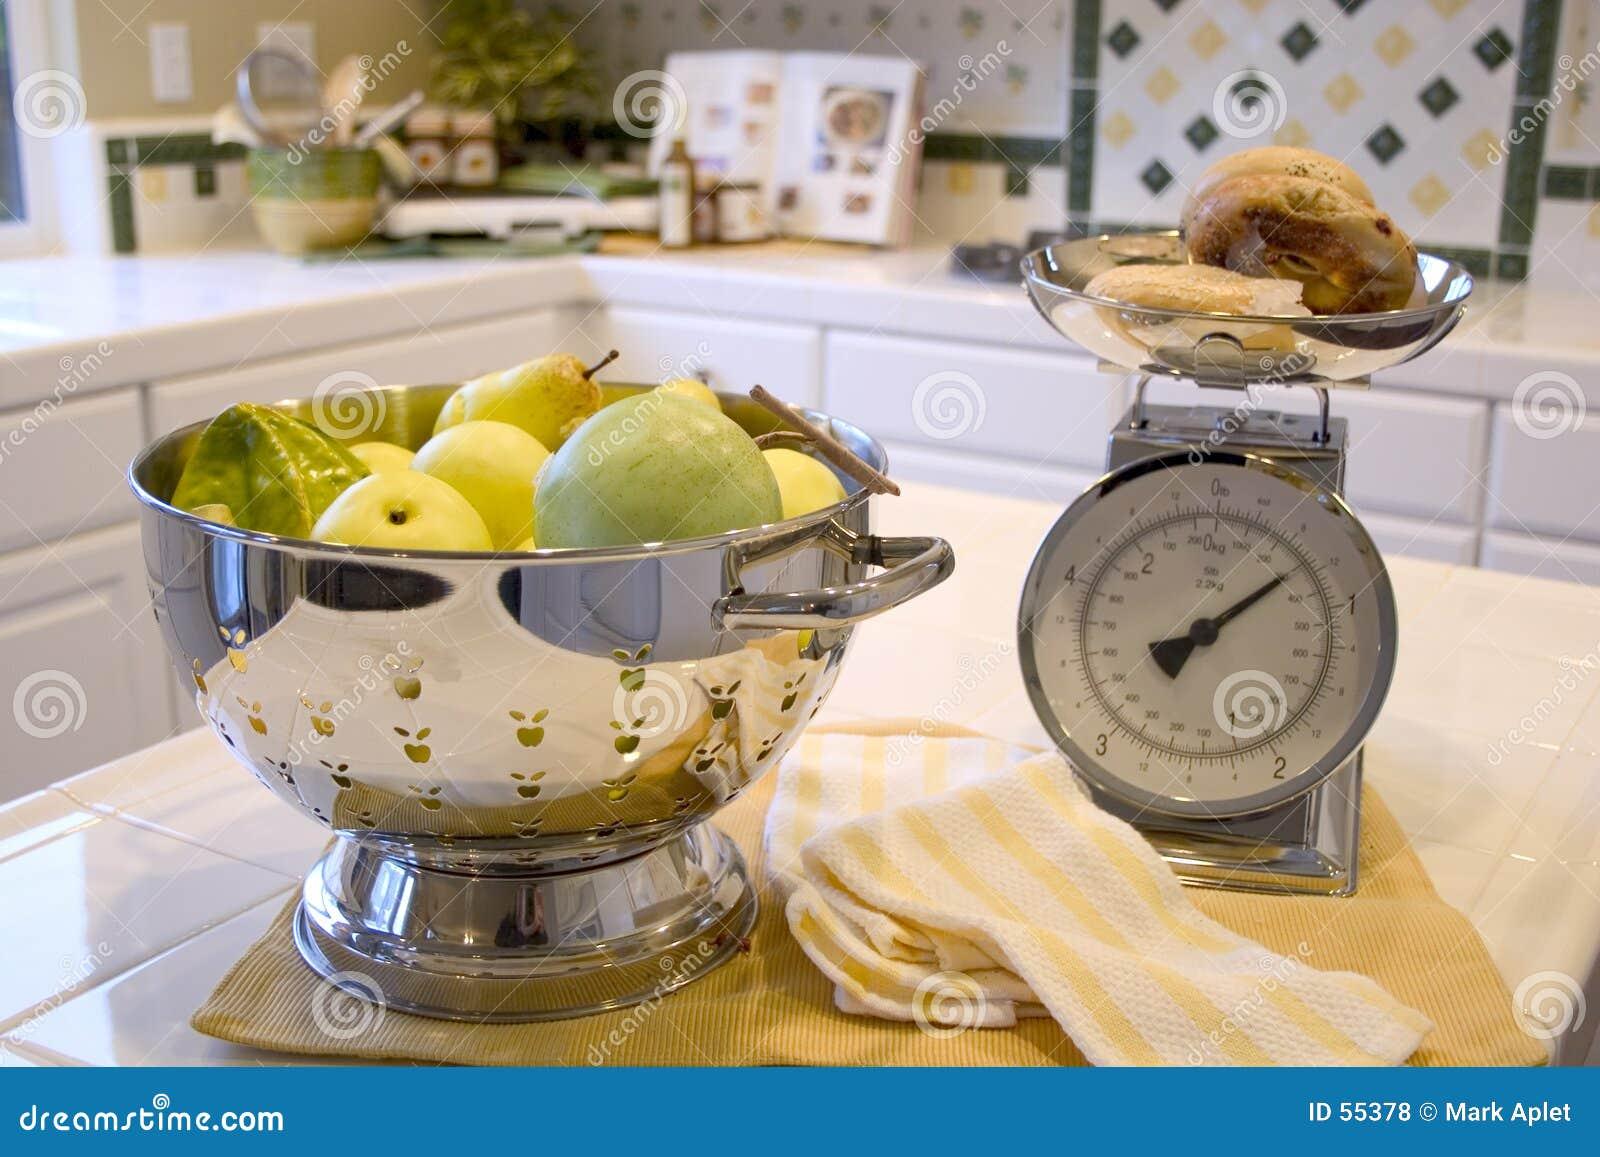 Download κουζίνα σύγχρονη στοκ εικόνες. εικόνα από προετοιμασία, σπίτι - 55378